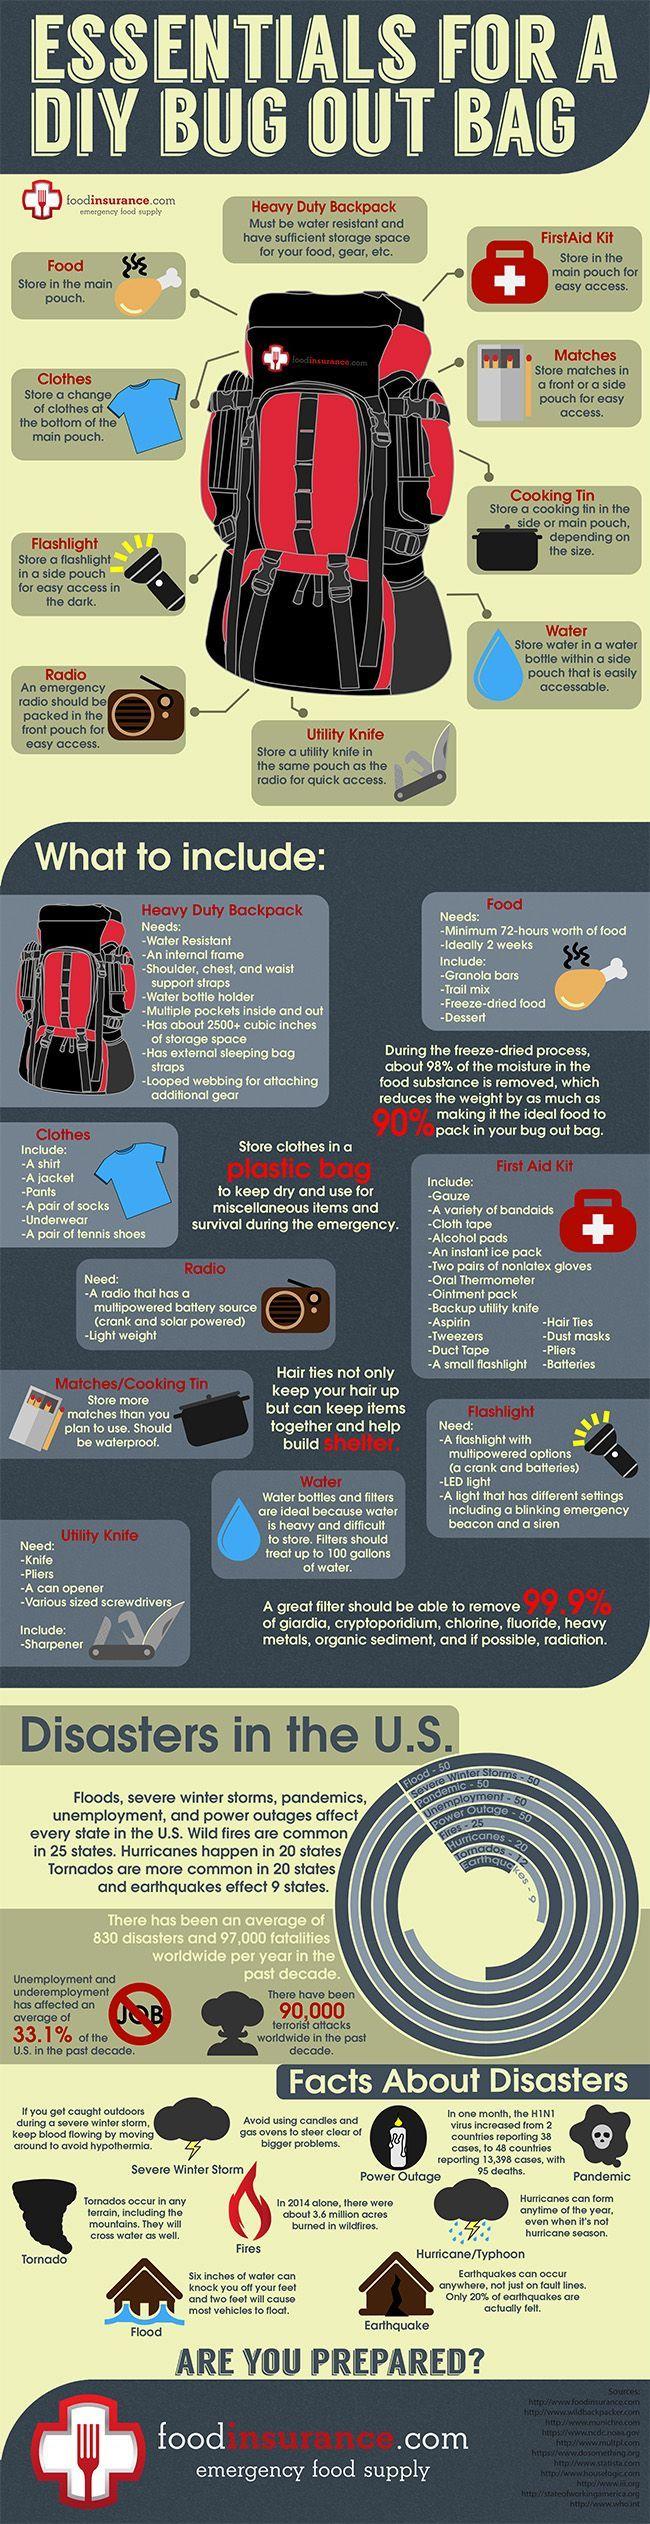 DIY Bug Out Bag Infographic   http://FoodInsurance.com